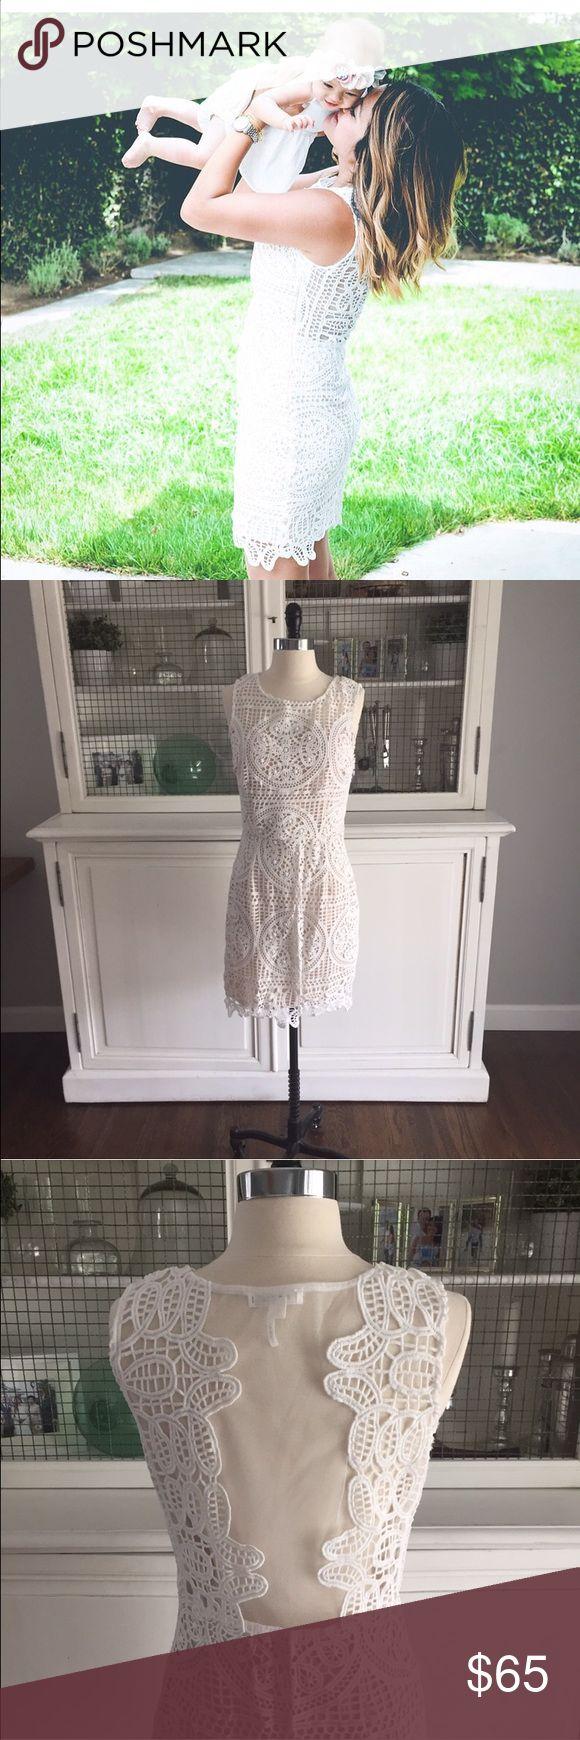 Soieblu lace ivory dress Lace with fine detail dress soieblu Dresses Mini